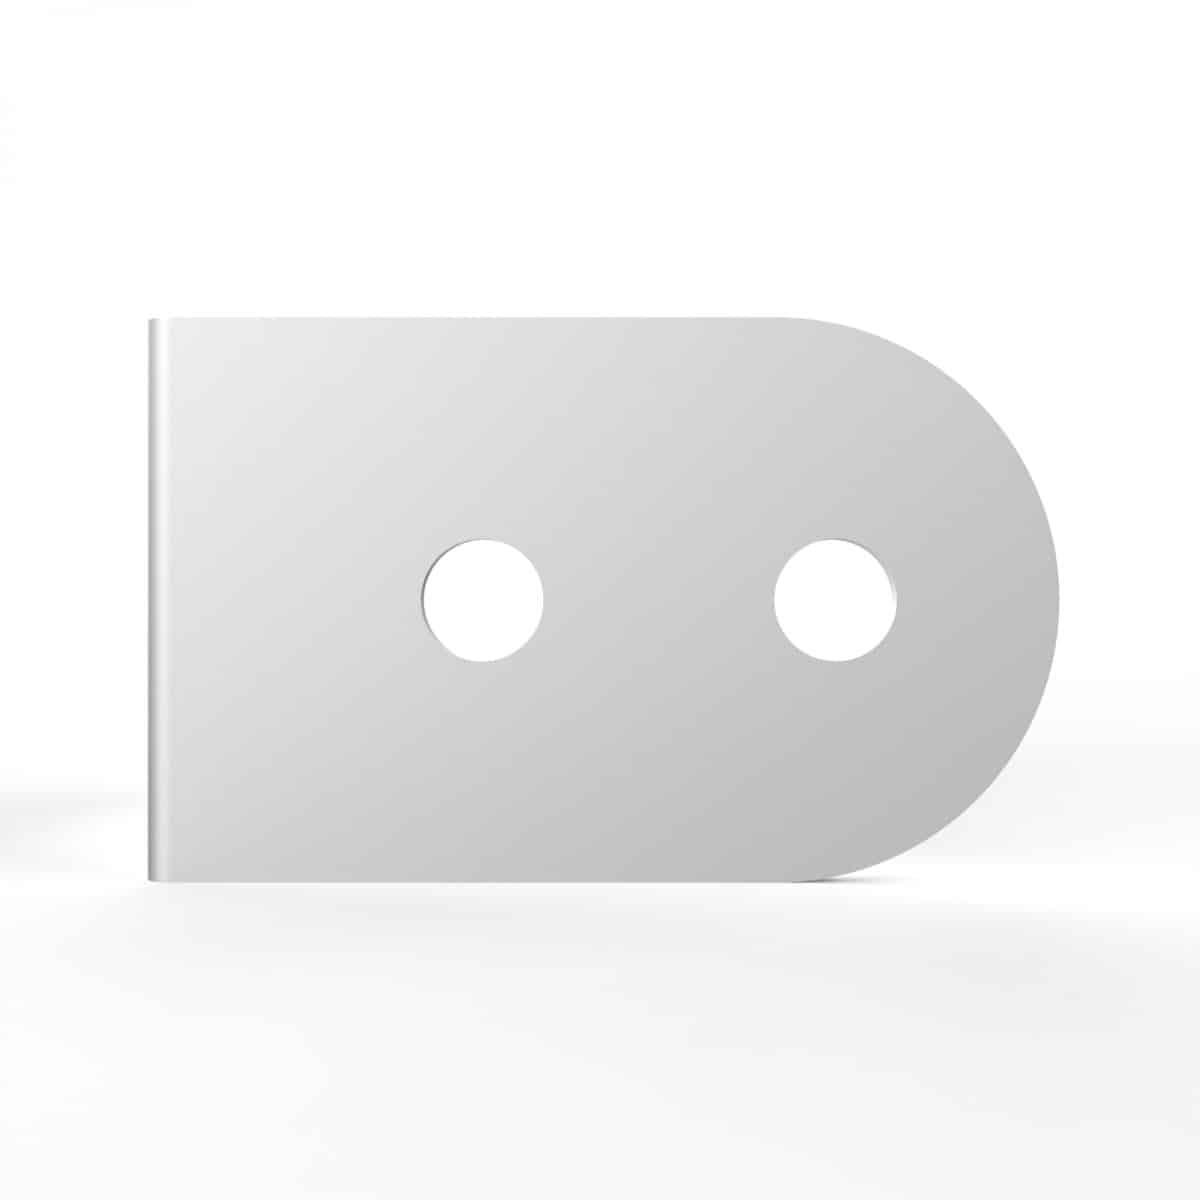 ARMOR Hardware B4602 4 Hole Corner Angle Steel Brace